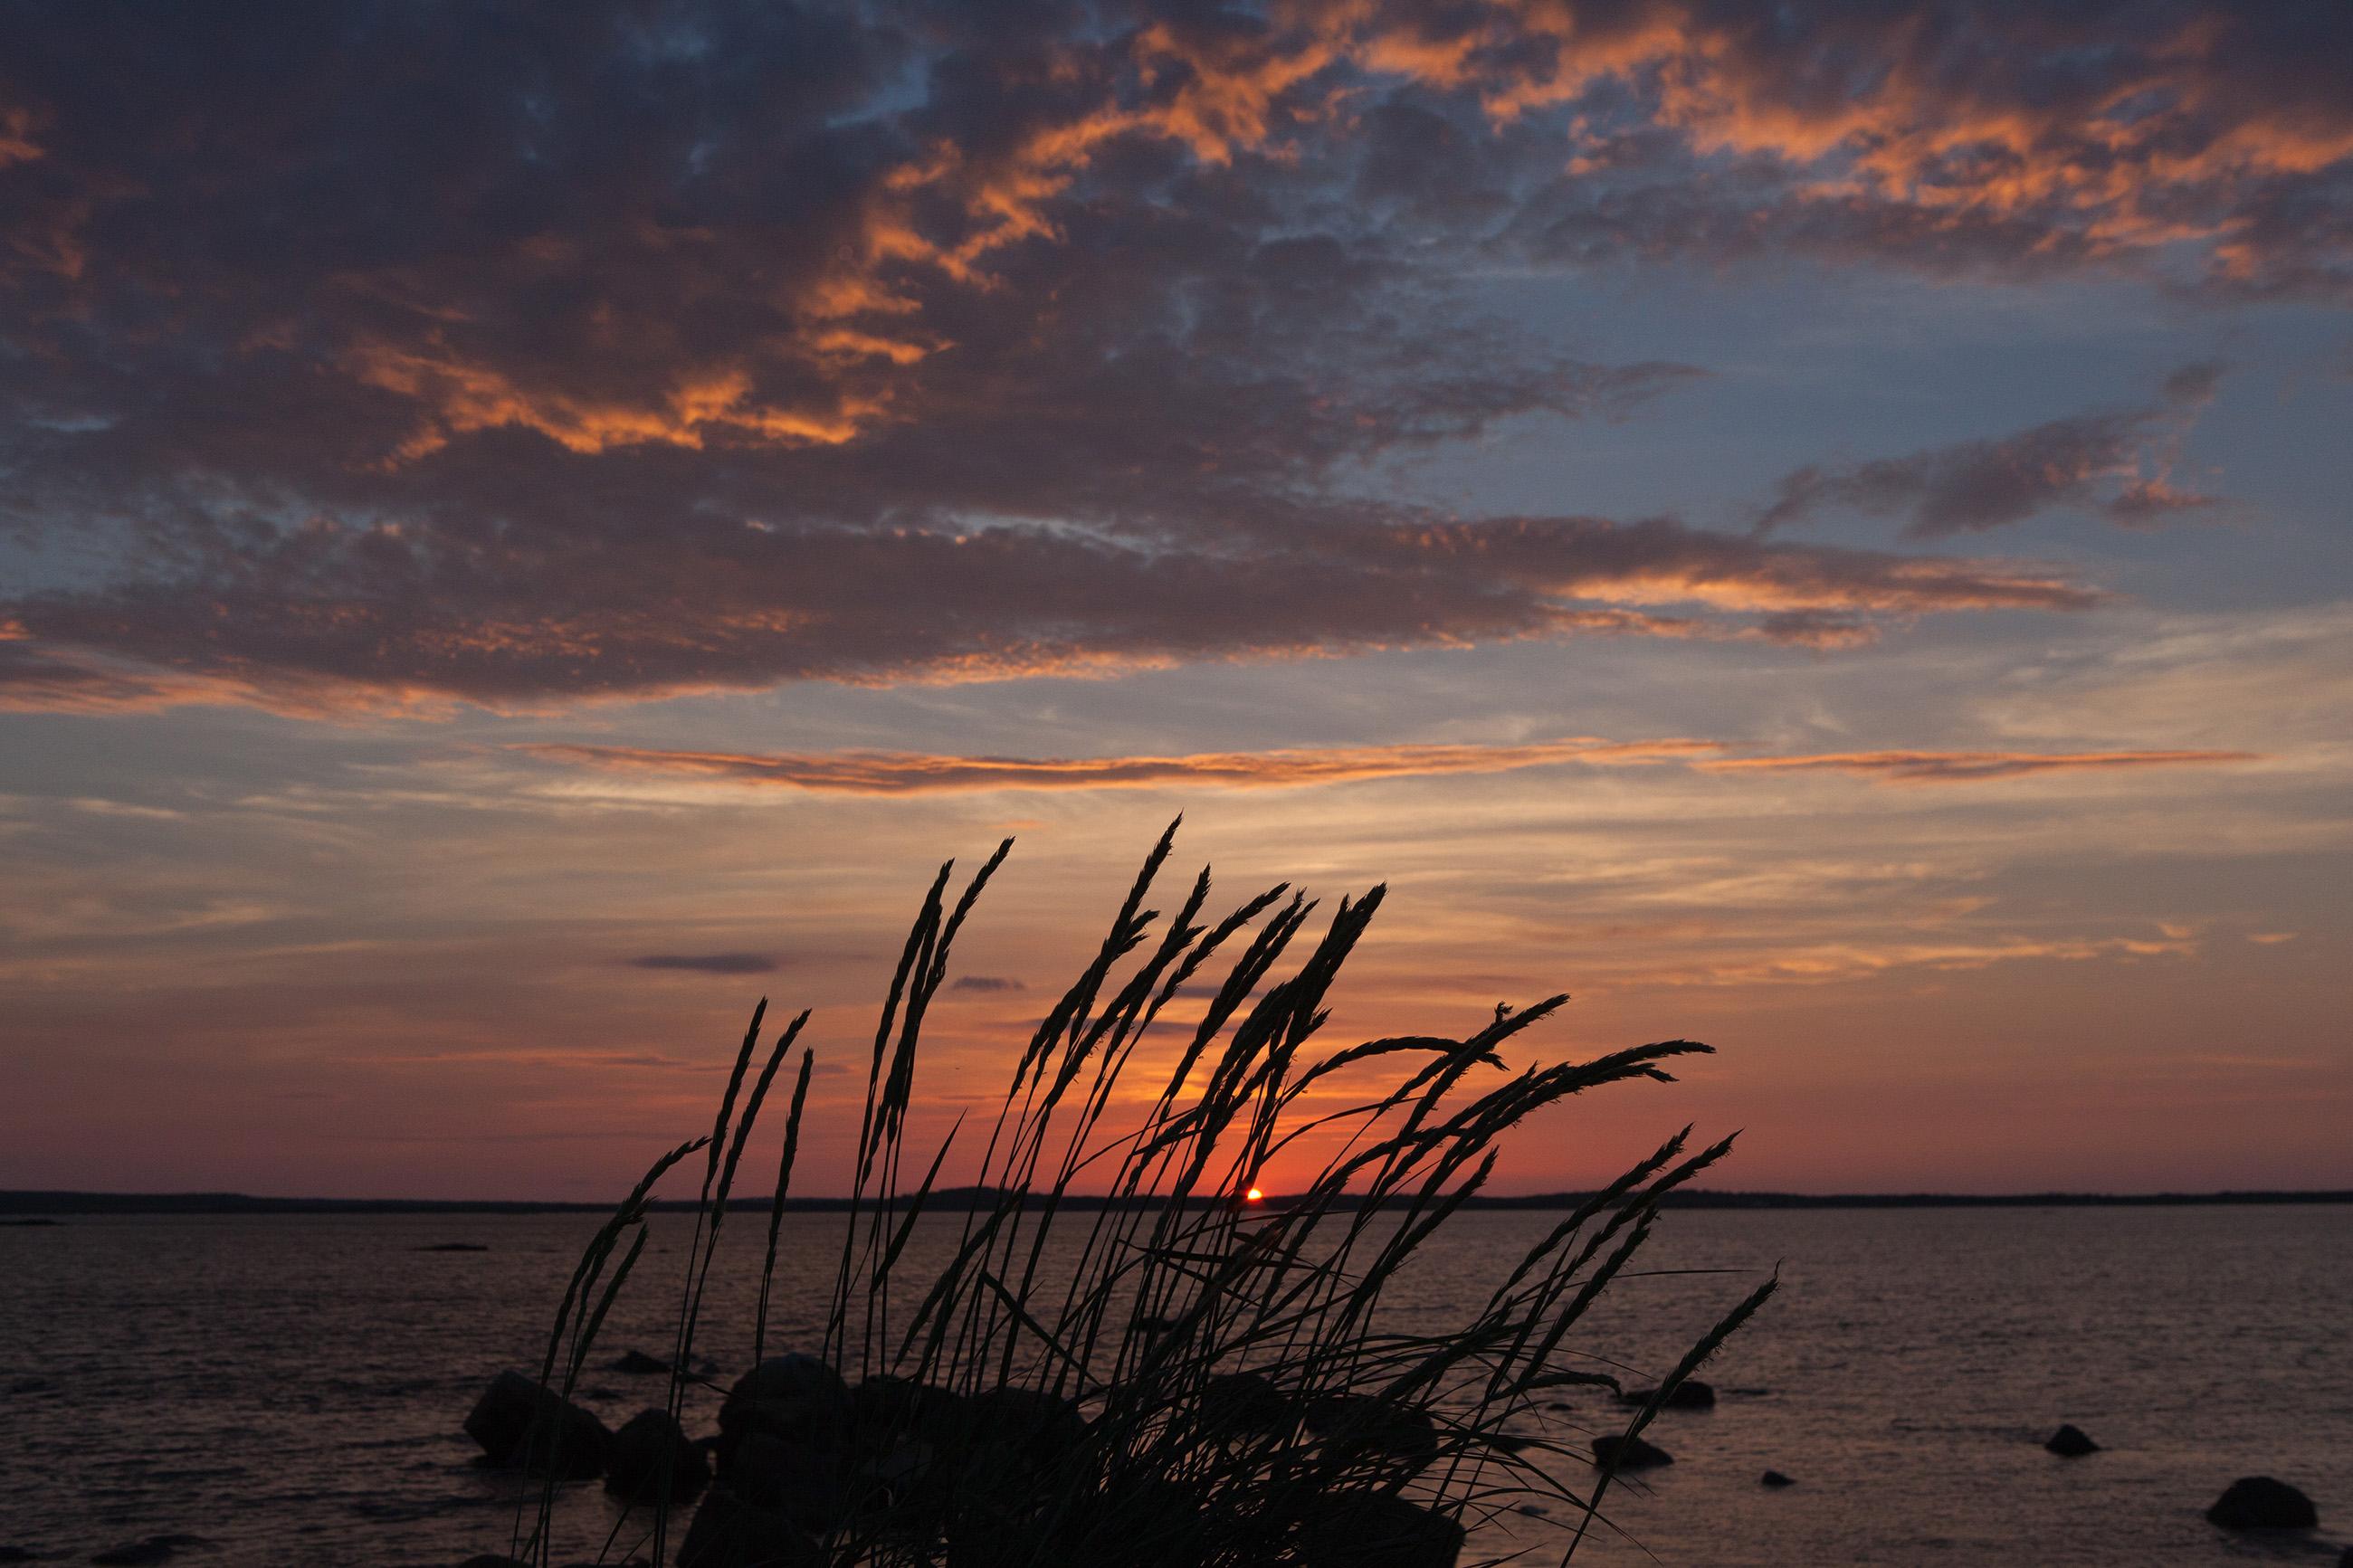 Ocean Sunset, Abstract, Sunlight, Scene, Scenery, HQ Photo